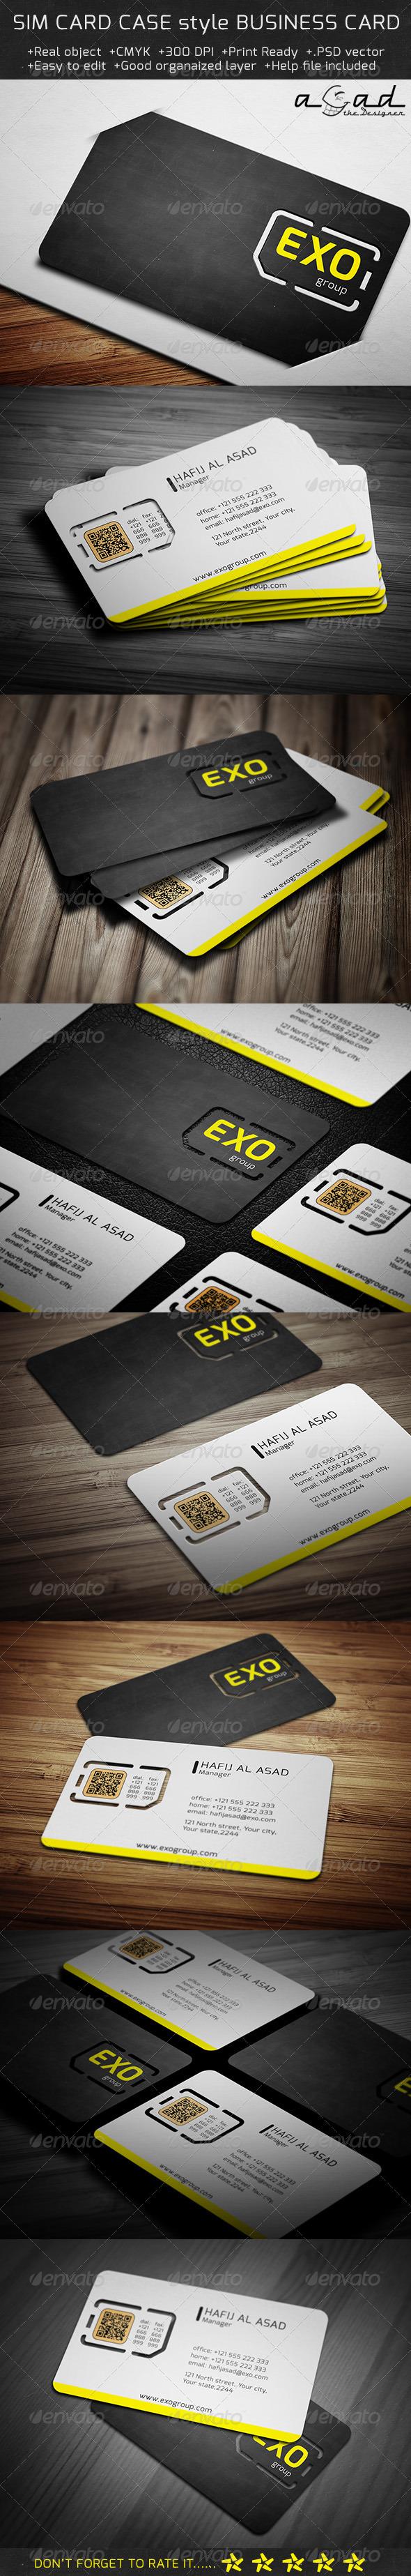 Sim Case Business Card Template SN-8 | Pinterest | Business cards ...